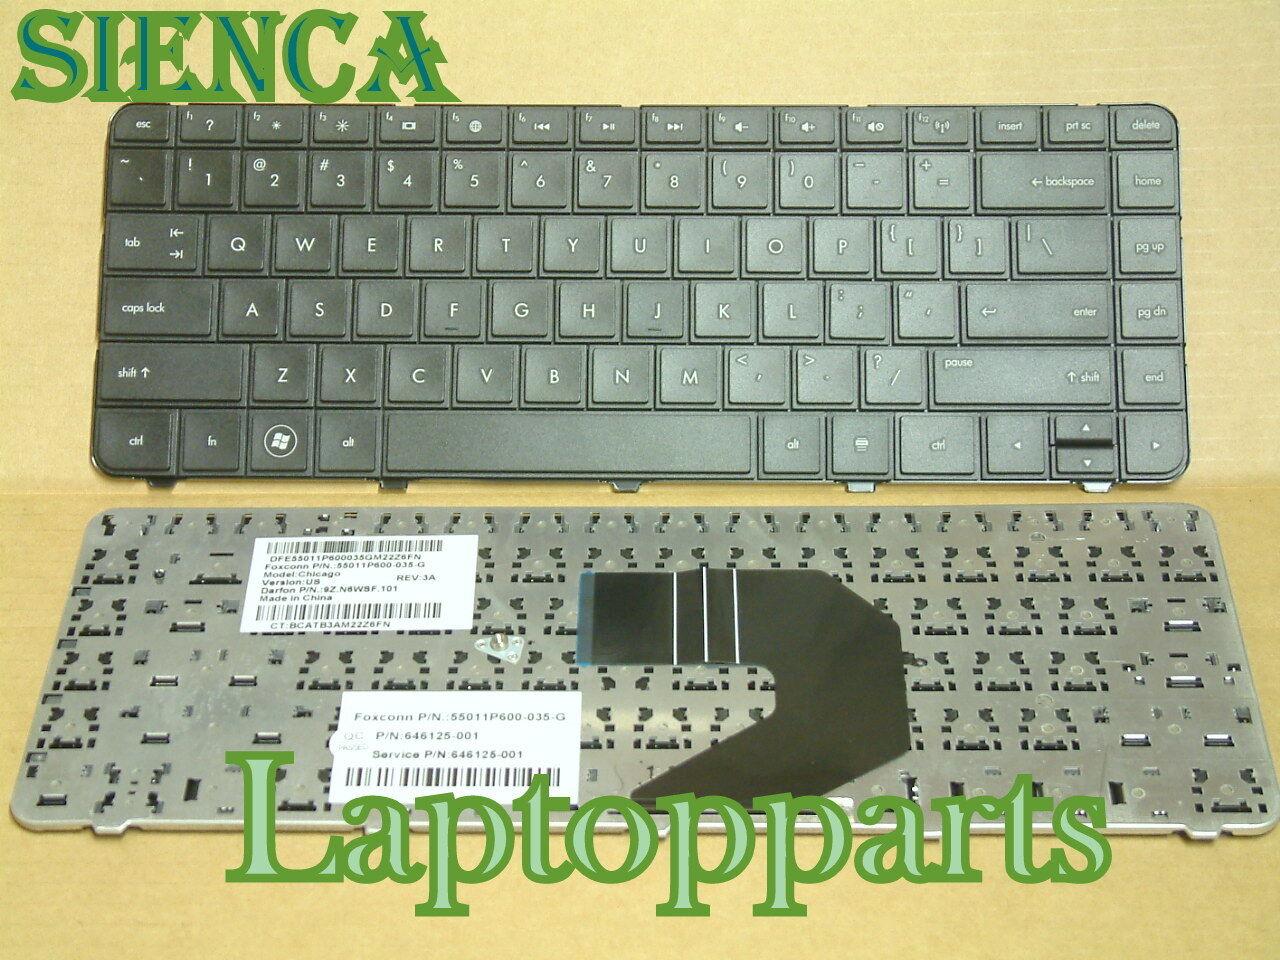 Keyboard For HP Pavilion G6 G6-1D G6-1000 G4 G4-1000 697529-001 698694-001